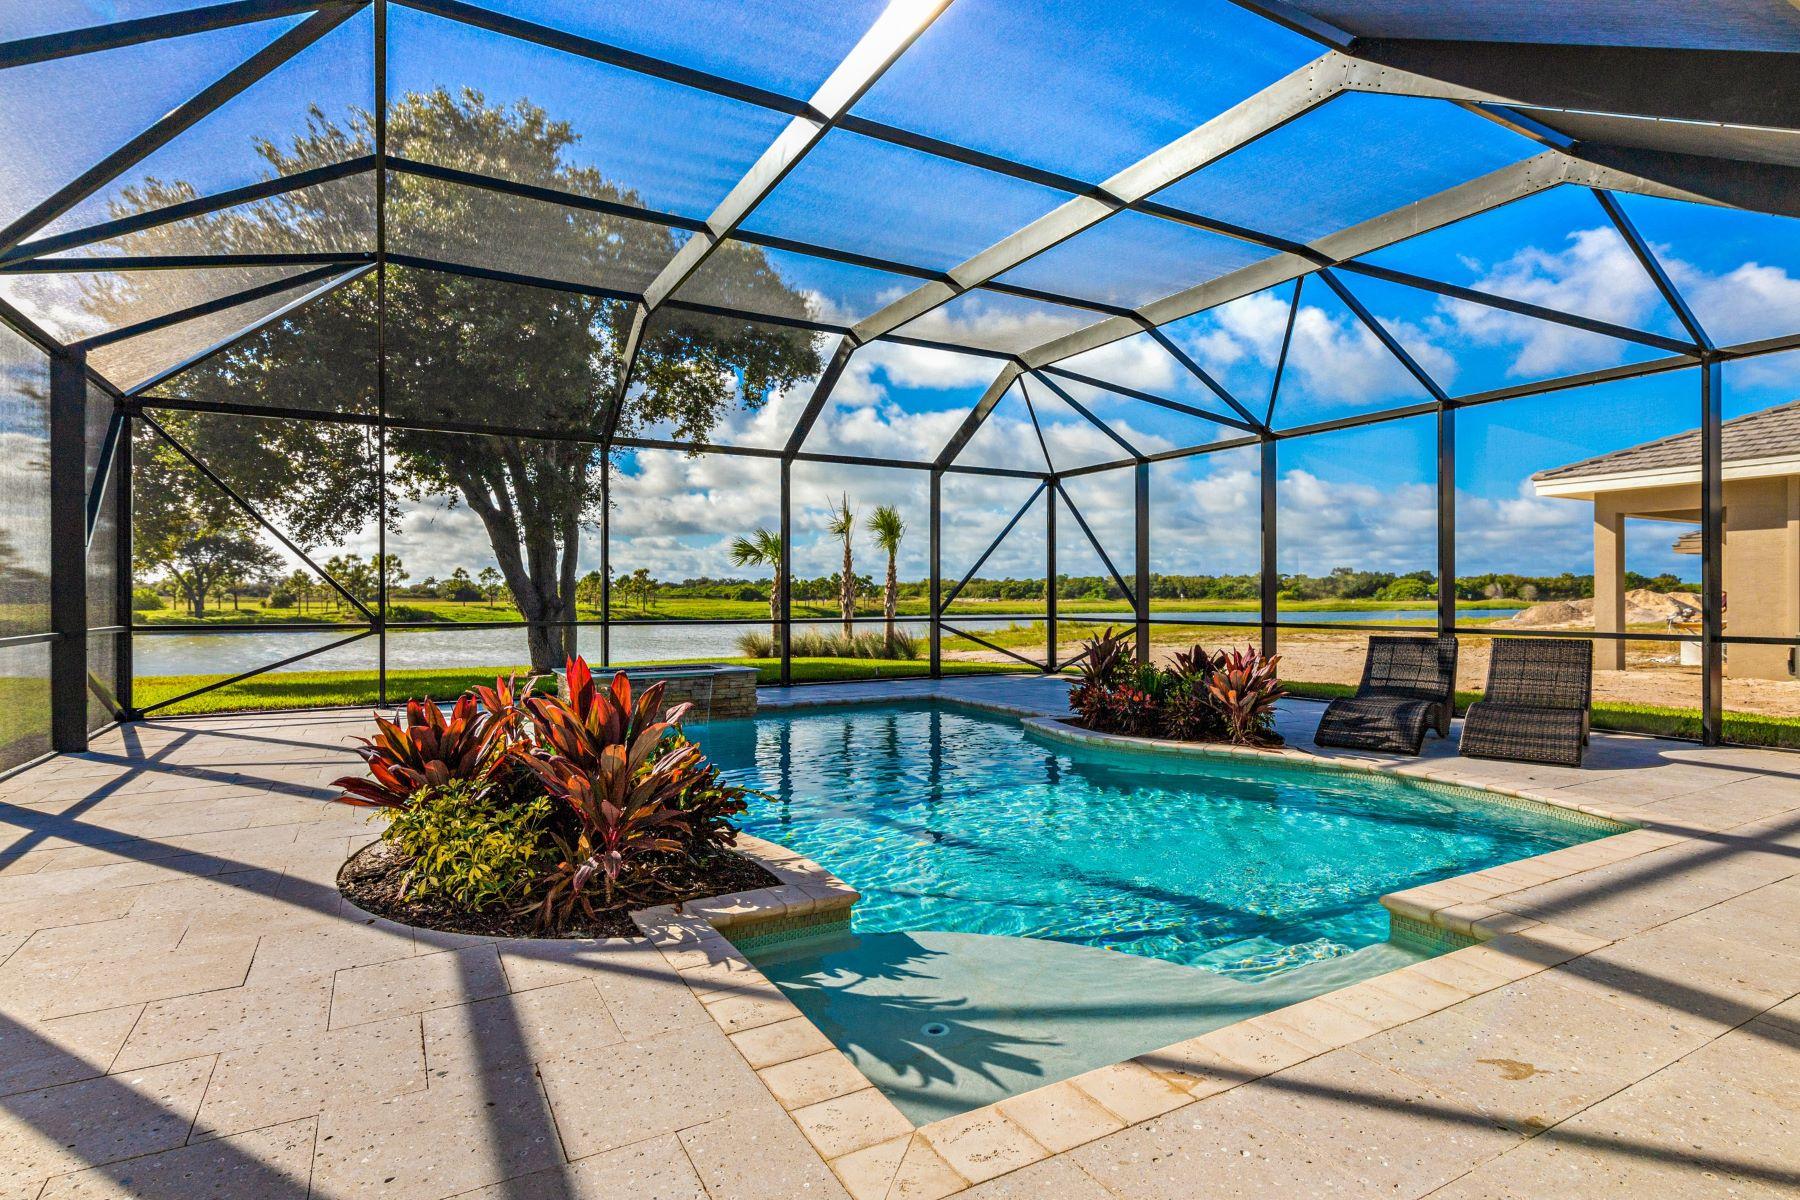 Luxury New Construction in Grand Harbor 2352 Grand Harbor Reserve Square Vero Beach, Florida 32967 Estados Unidos